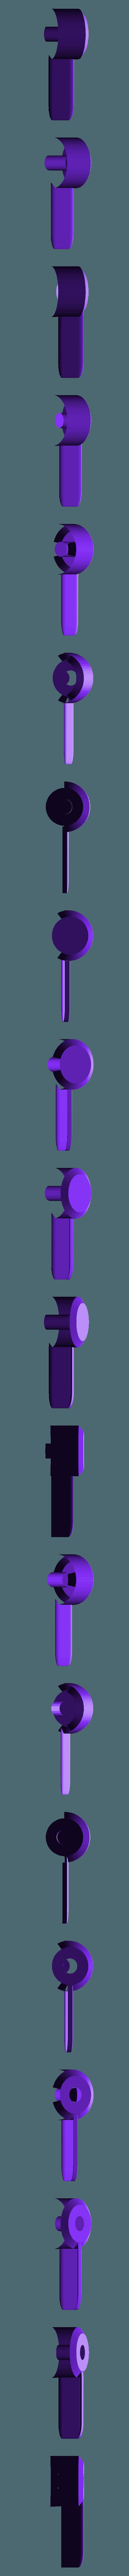 BSL_Tube_dimmswitch.stl Download free STL file Bedside Lamp (Tube), LED 12V 2.5W • 3D printer model, Seabird